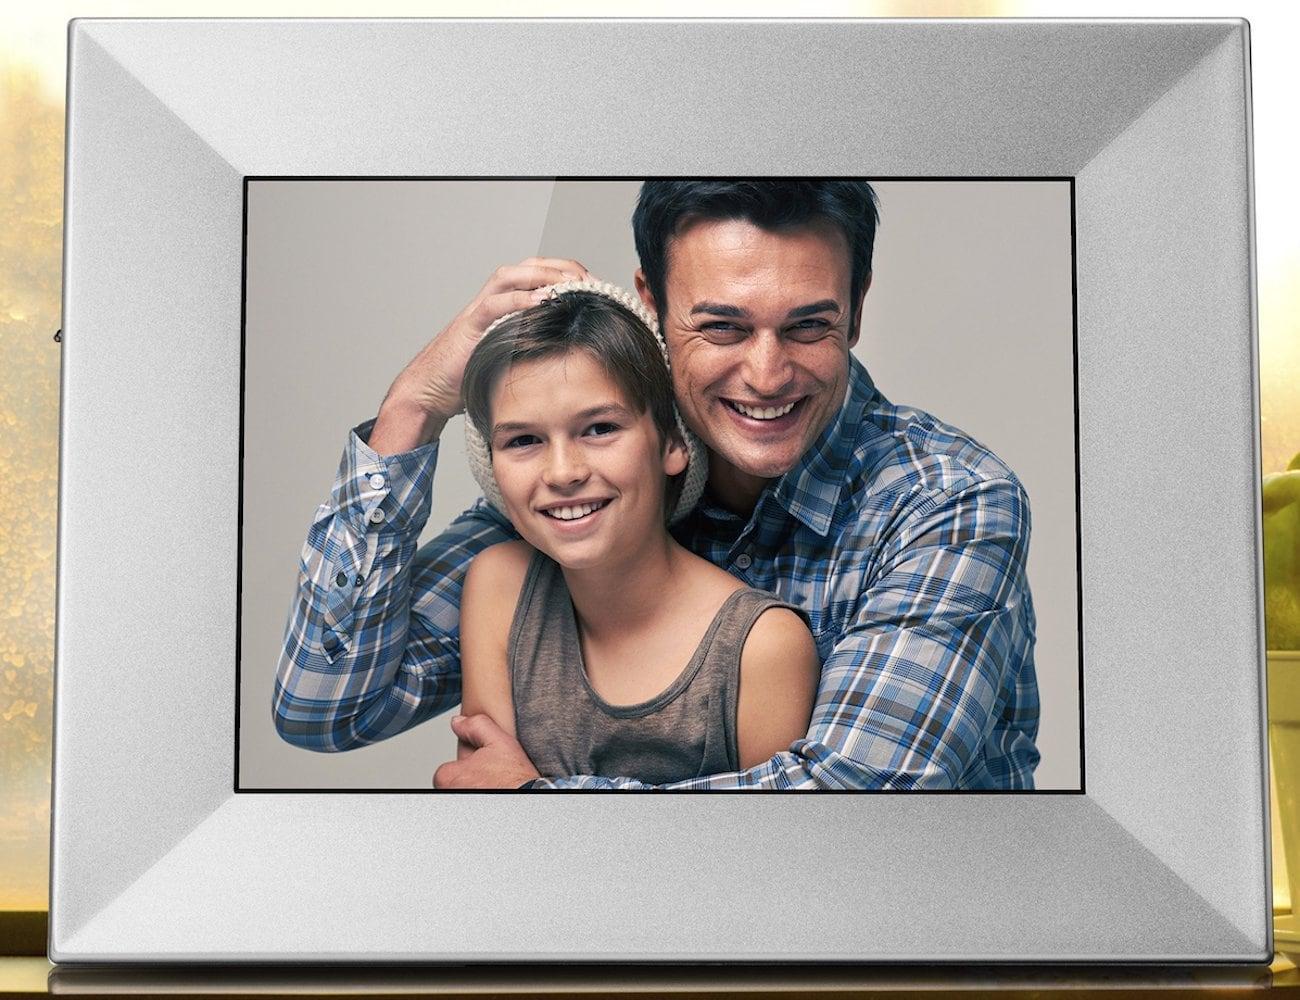 Nixplay Iris Wi-Fi Digital Picture Frame